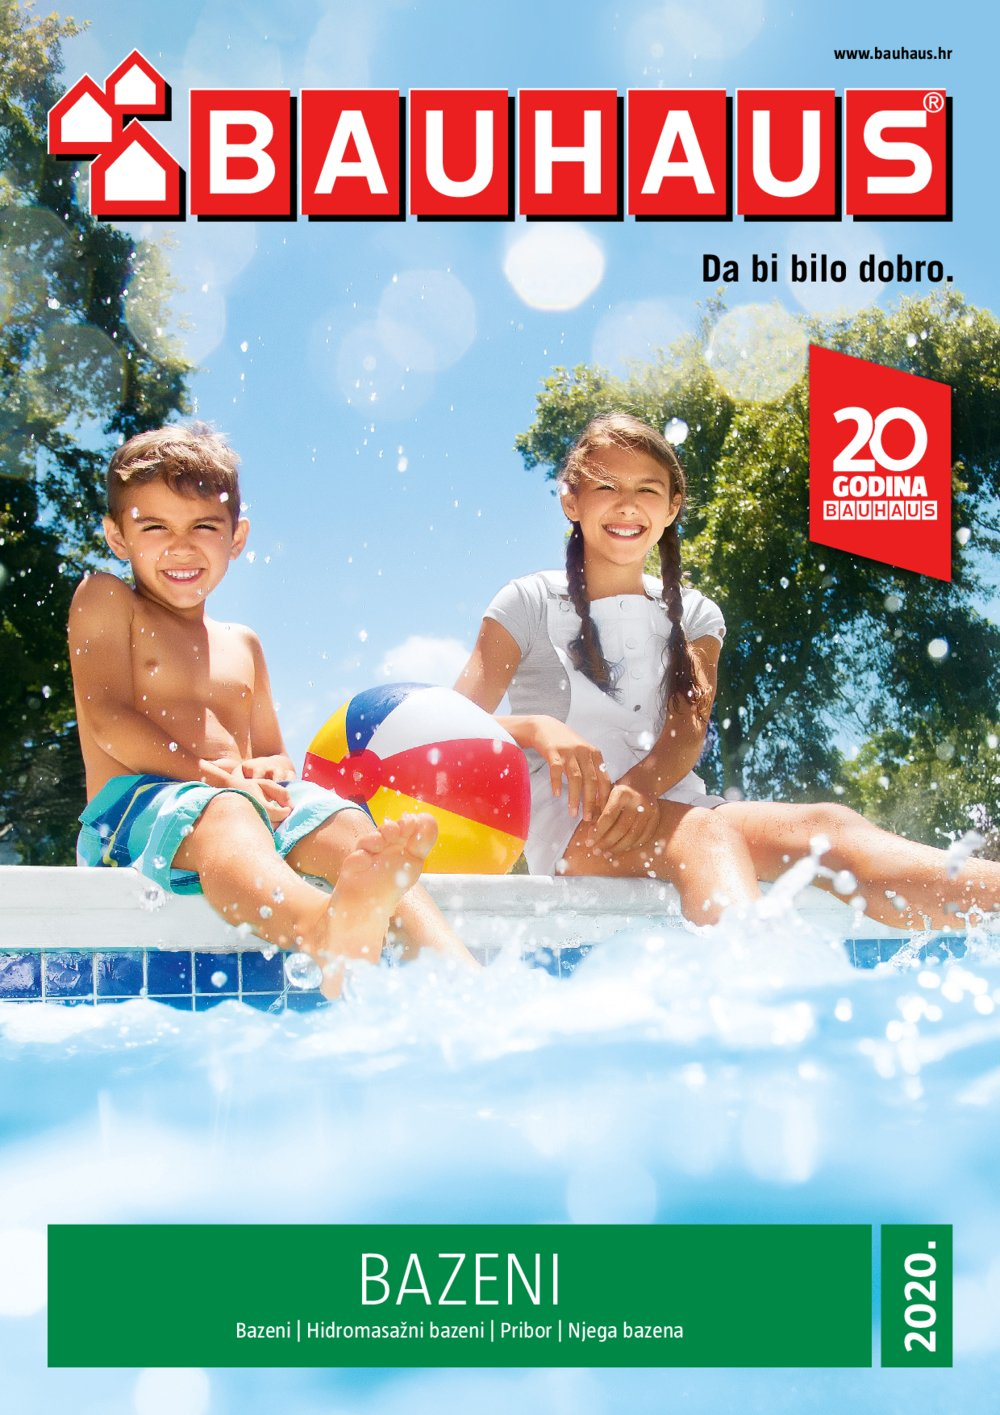 Bauhaus katalog Bazeni 21.05.-31.08.2020.